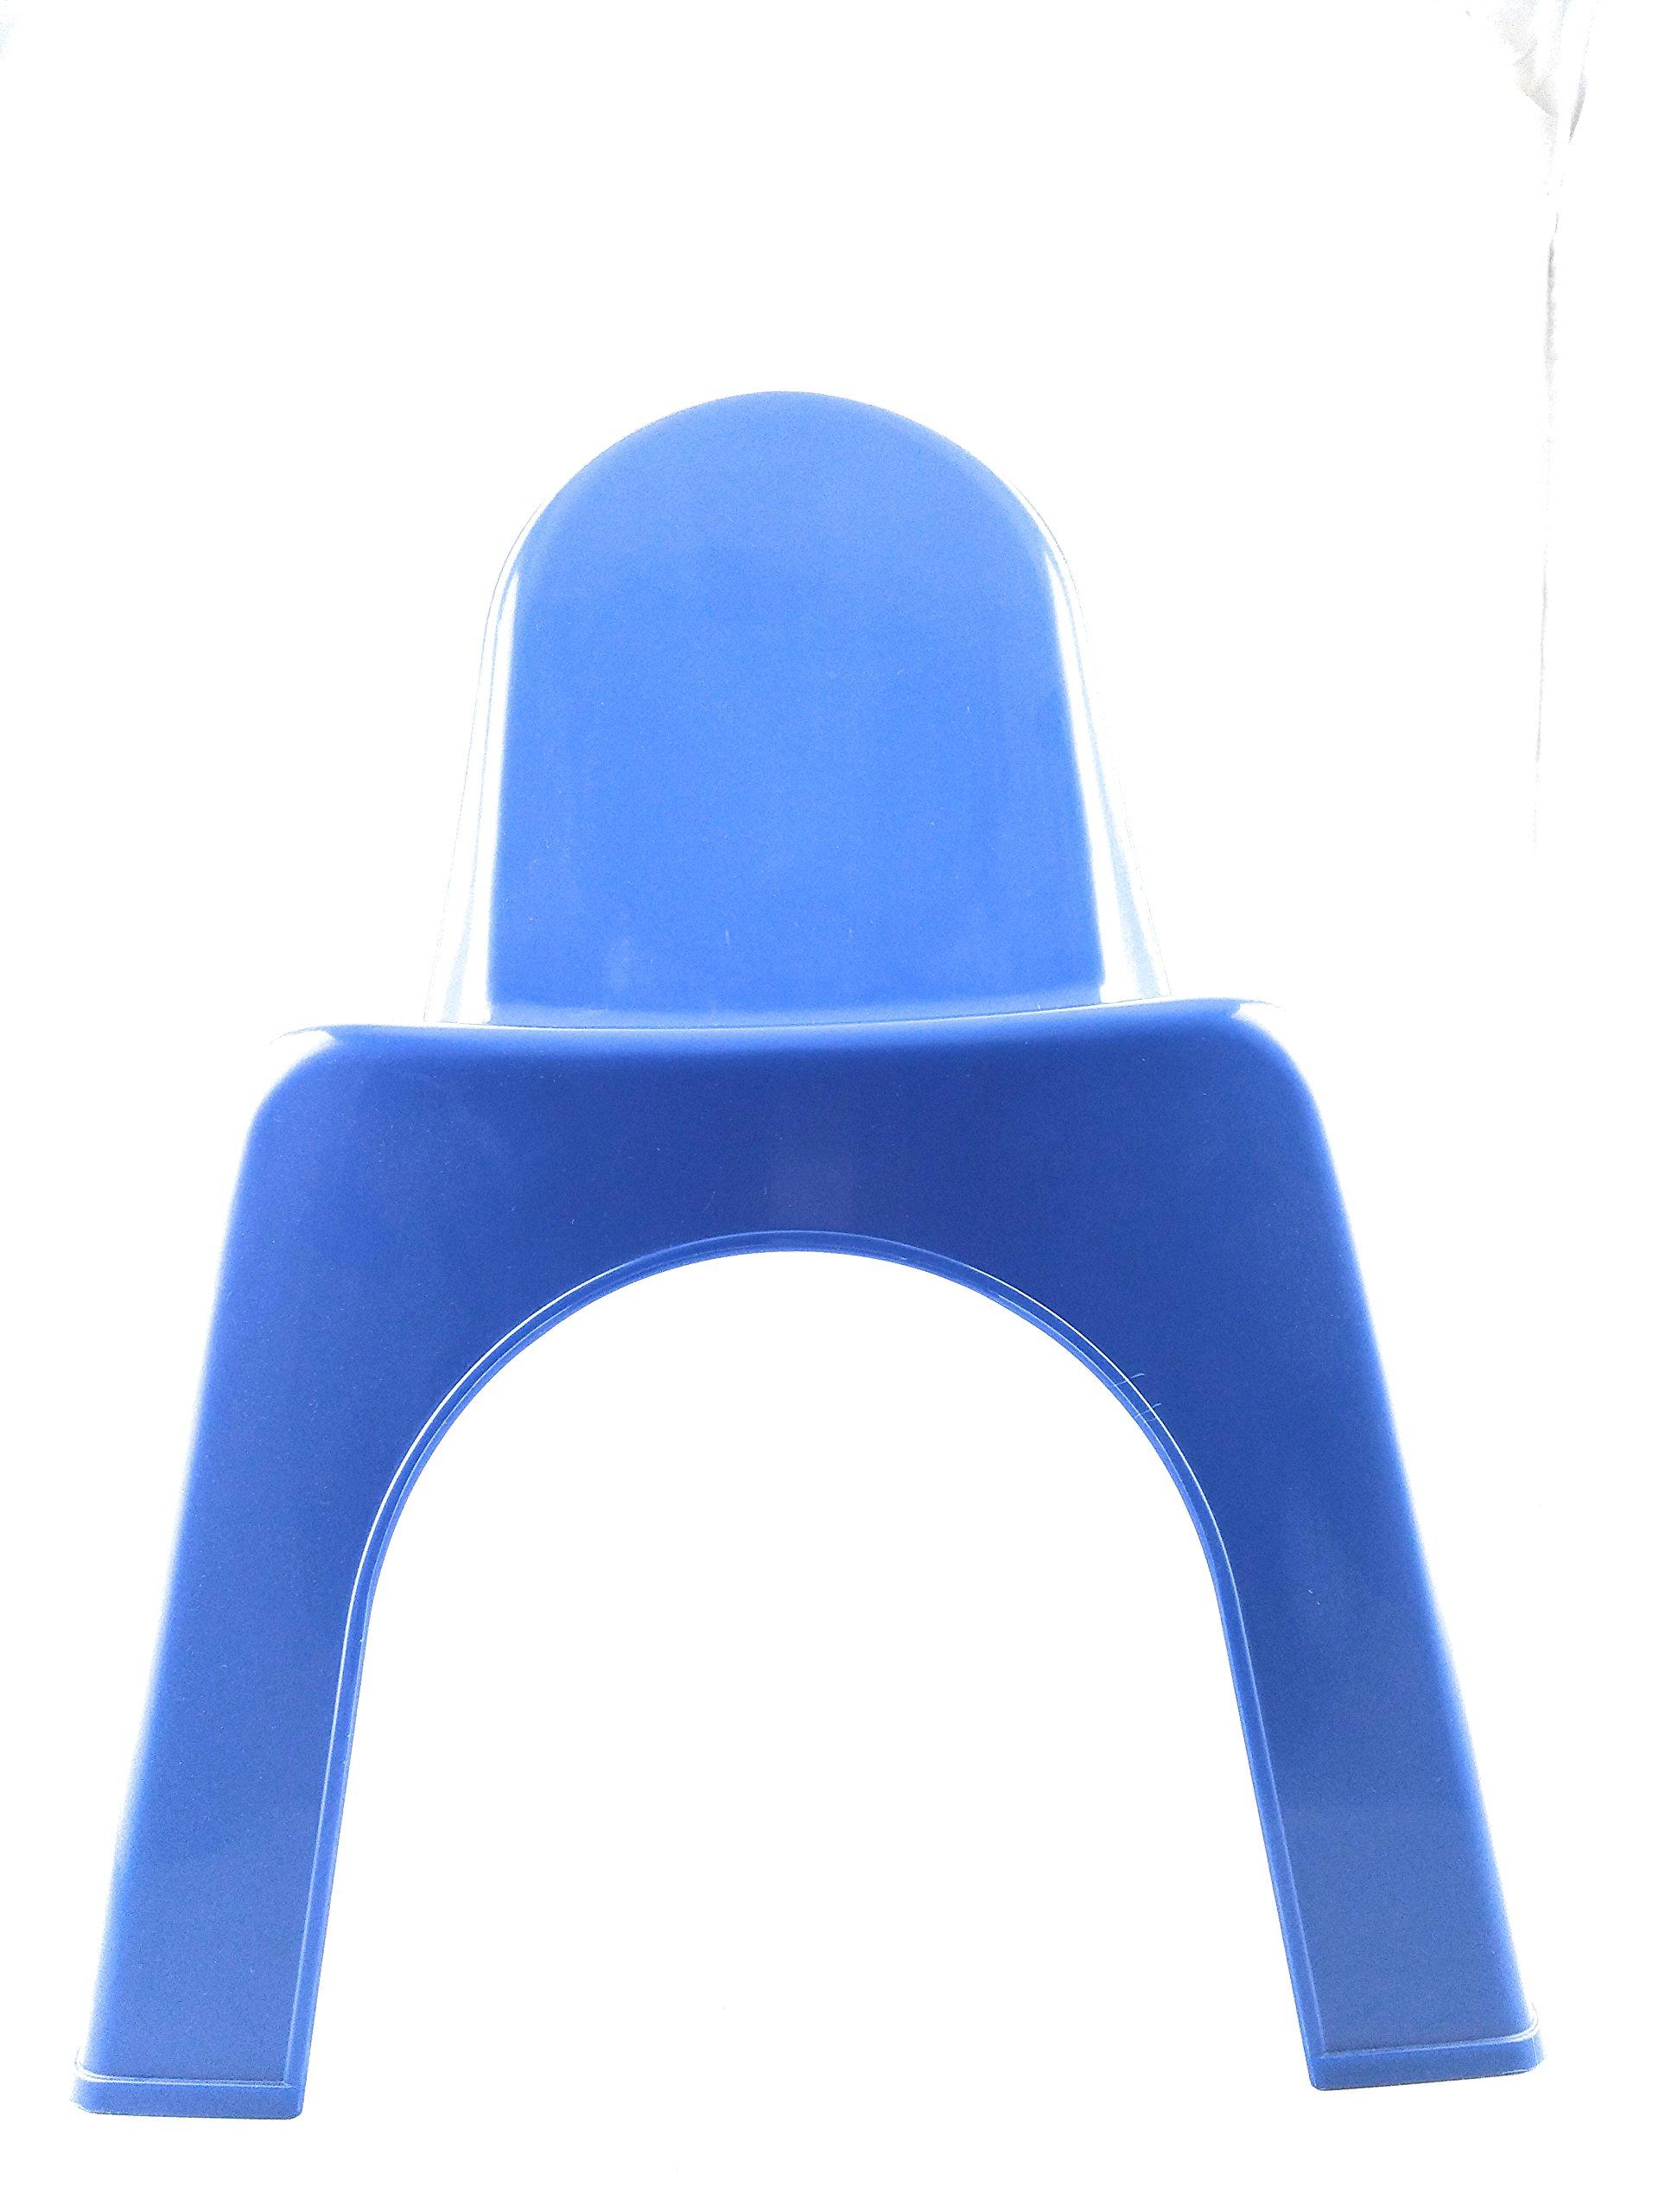 Child's Blue Plastic Chair